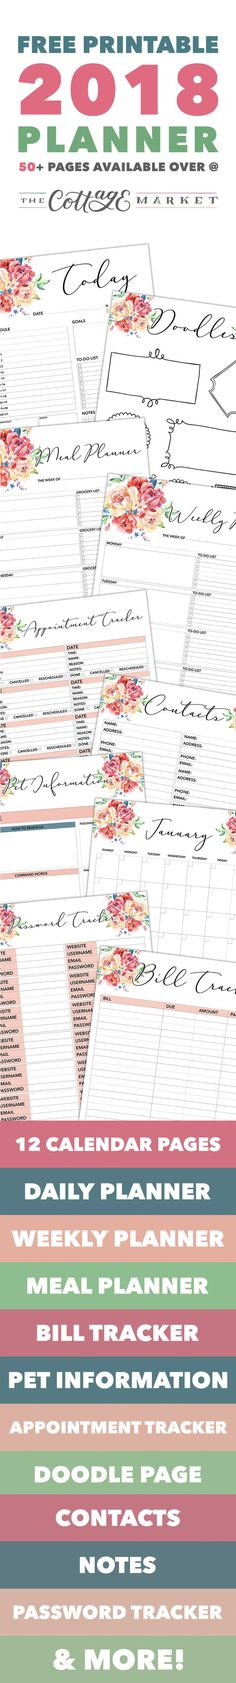 Free Printable 2018 Planner 50 Plus Printable Pages